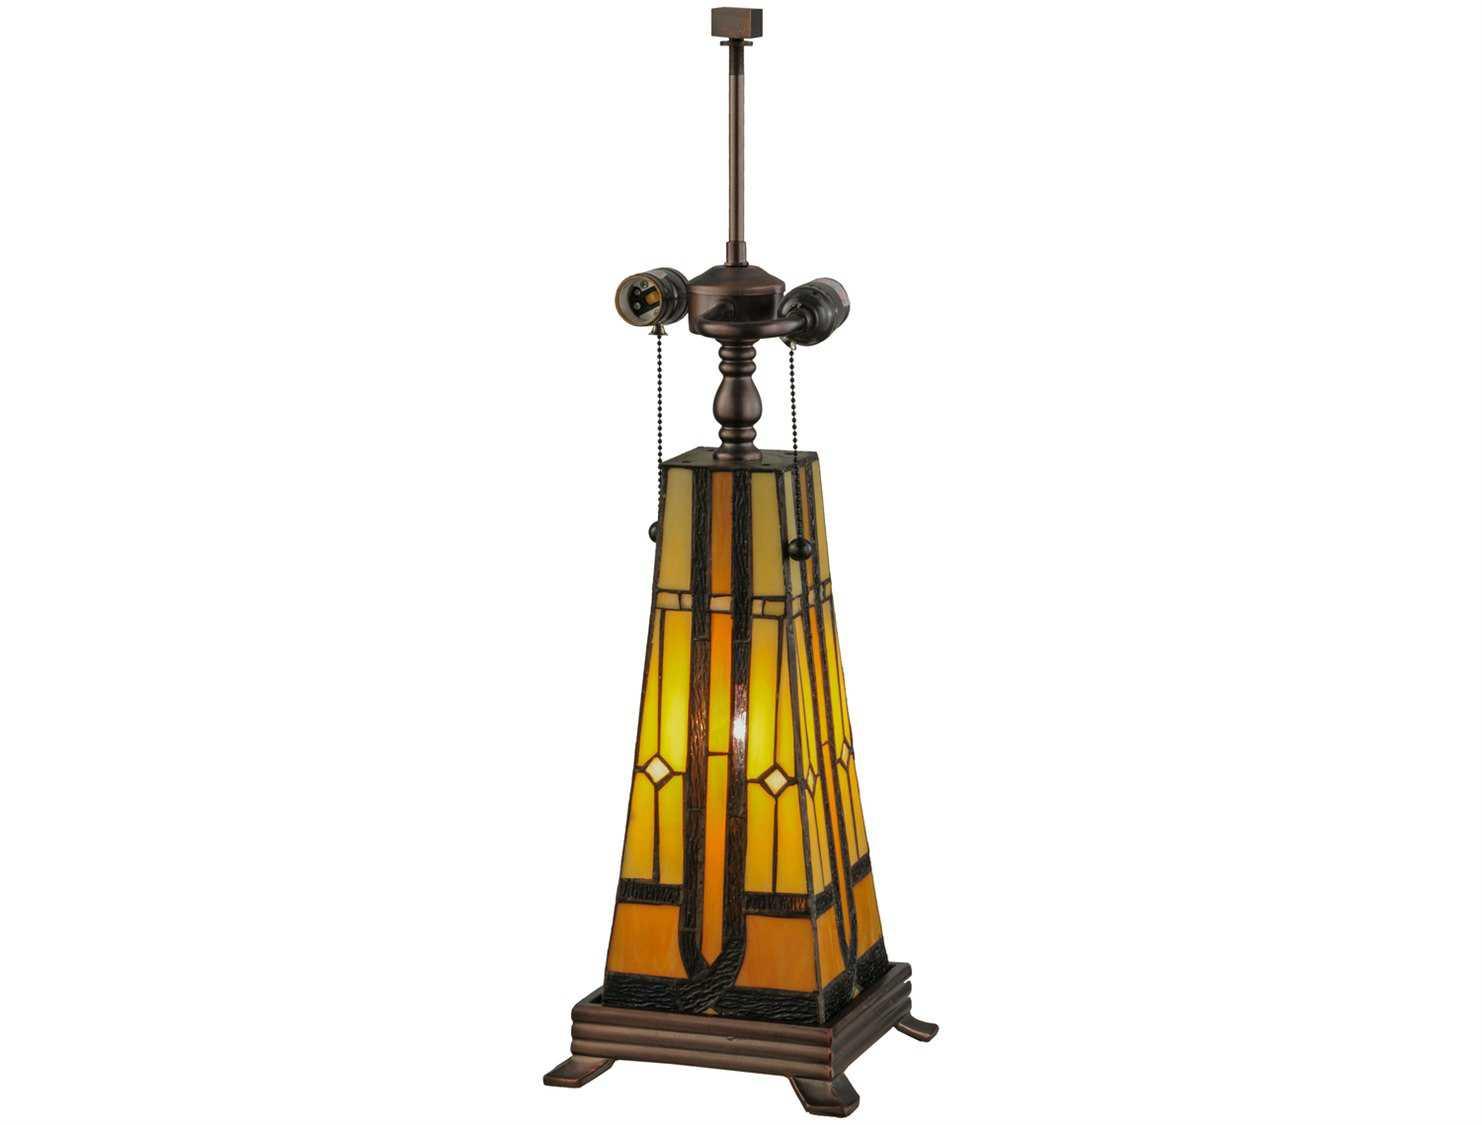 Meyda Tiffany Sierra Prairie Mission Lighted Table Lamp